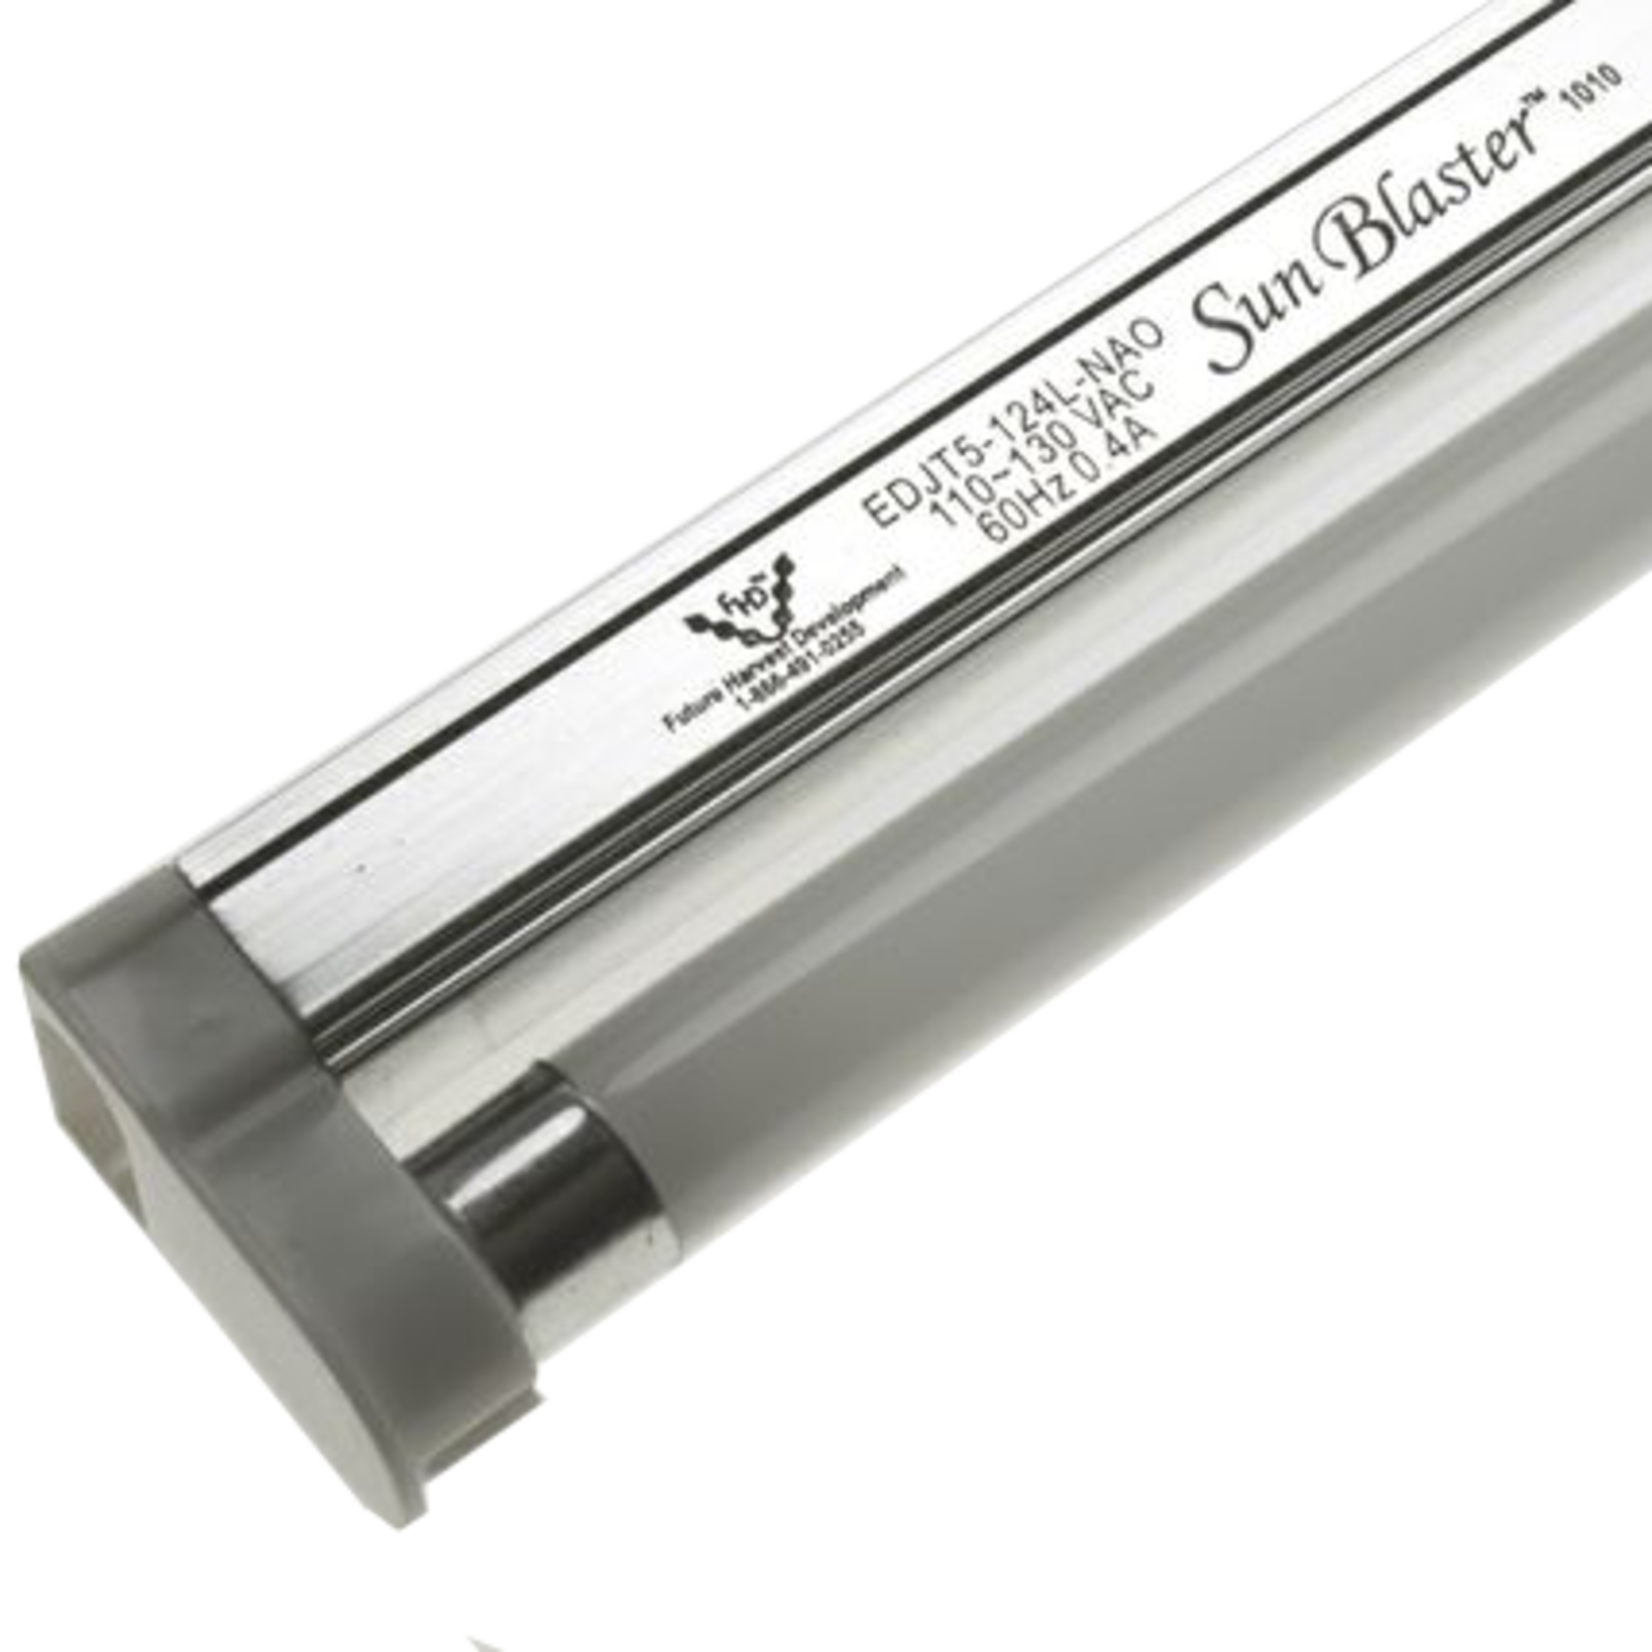 Sunblaster SUNBLASTER NEON T5 FIXTURE